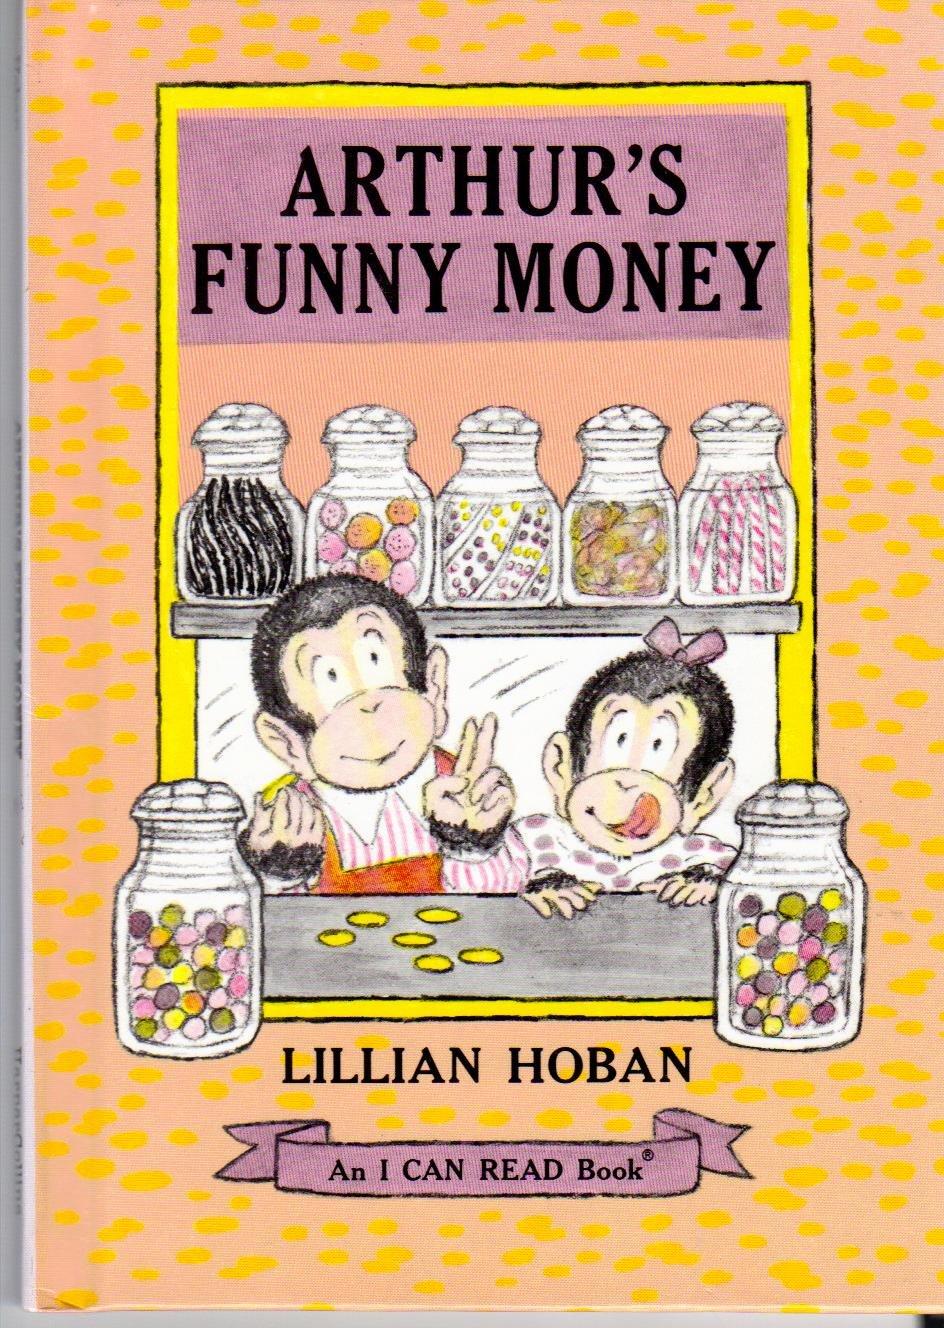 Arthur's funny money (An I can read book)